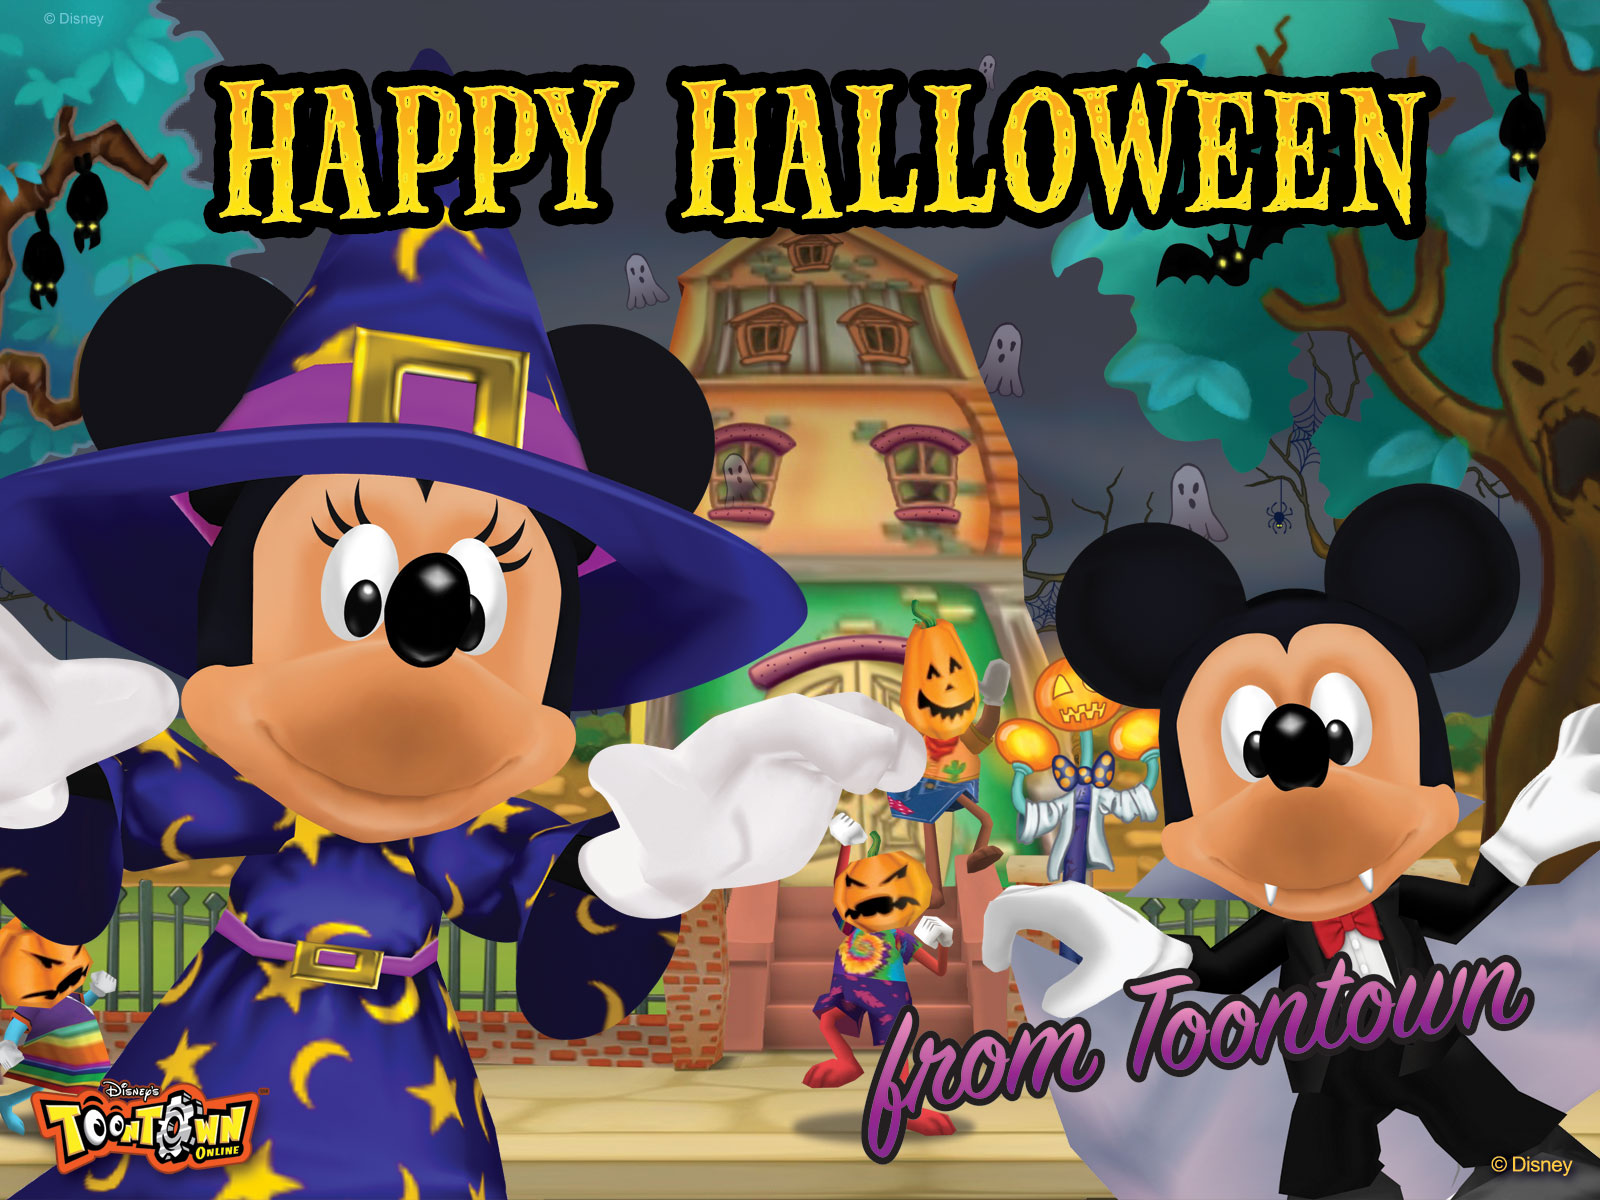 Wonderful Wallpaper Halloween Mickey Mouse - toontown-wallpaper-toontown-23526056-1600-1200  Photograph_27893.jpg